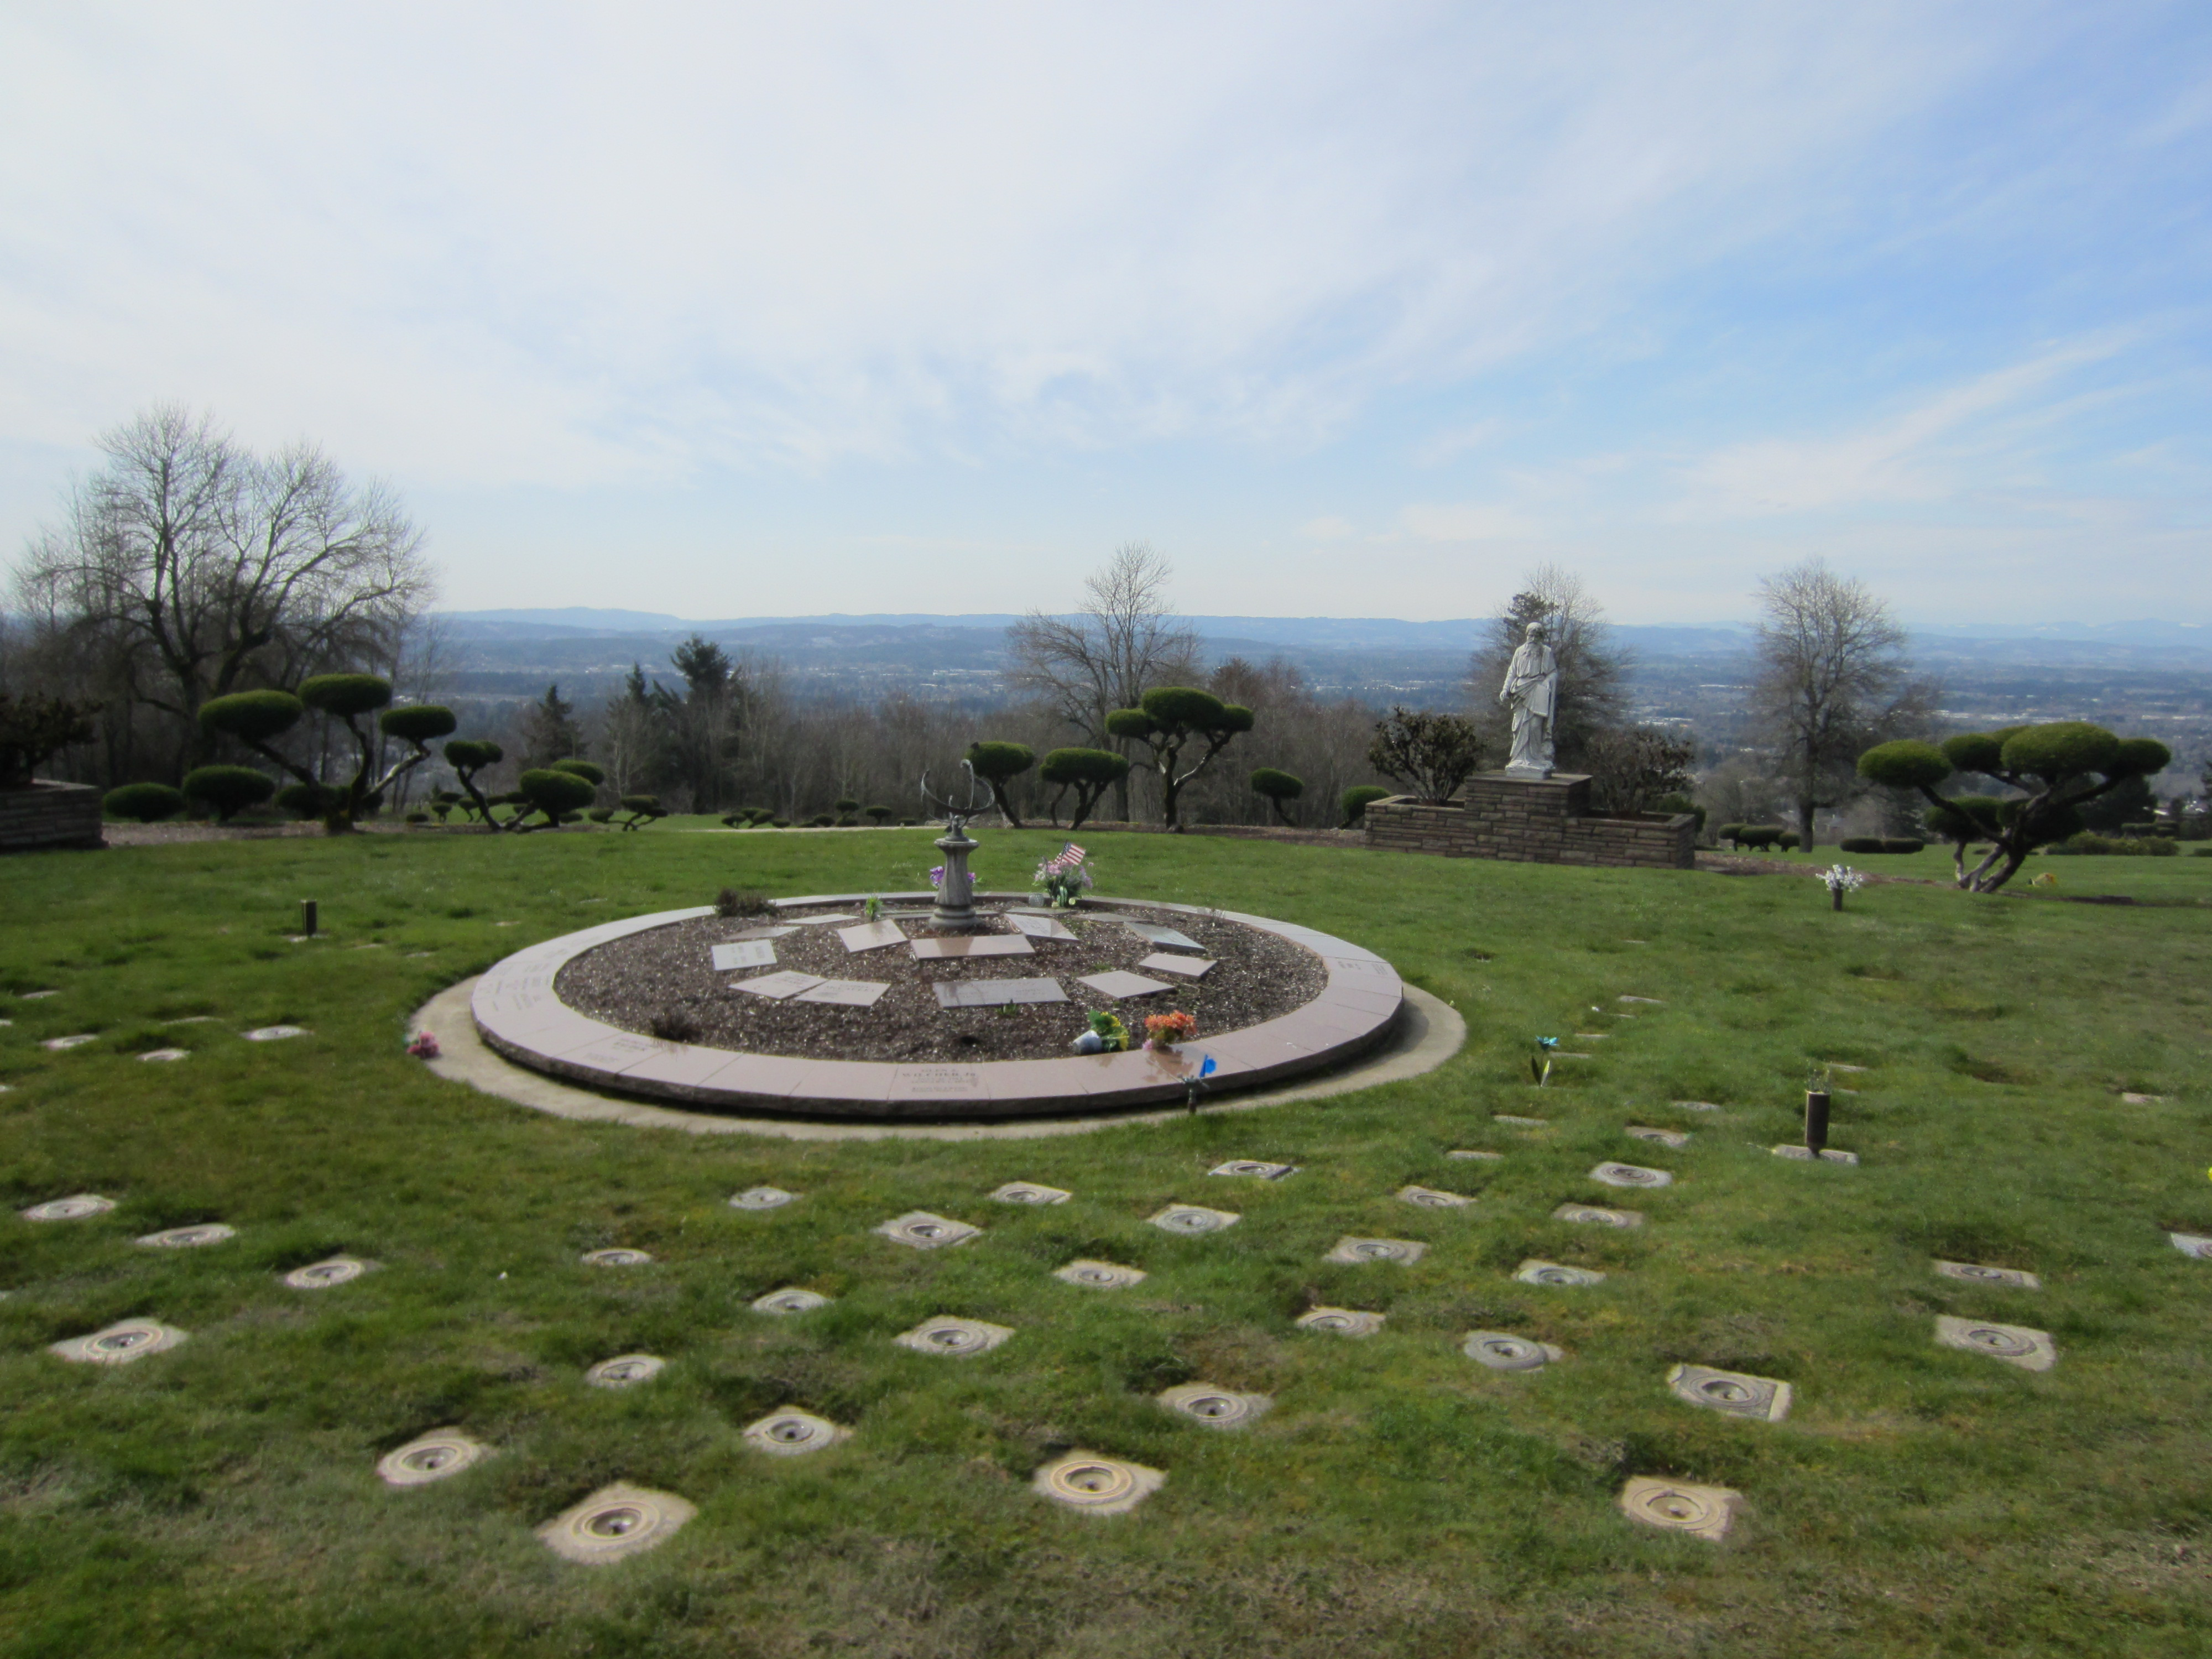 File Skyline Memorial Gardens And Funeral Home Portland 2012 12 Jpg Wikimedia Commons